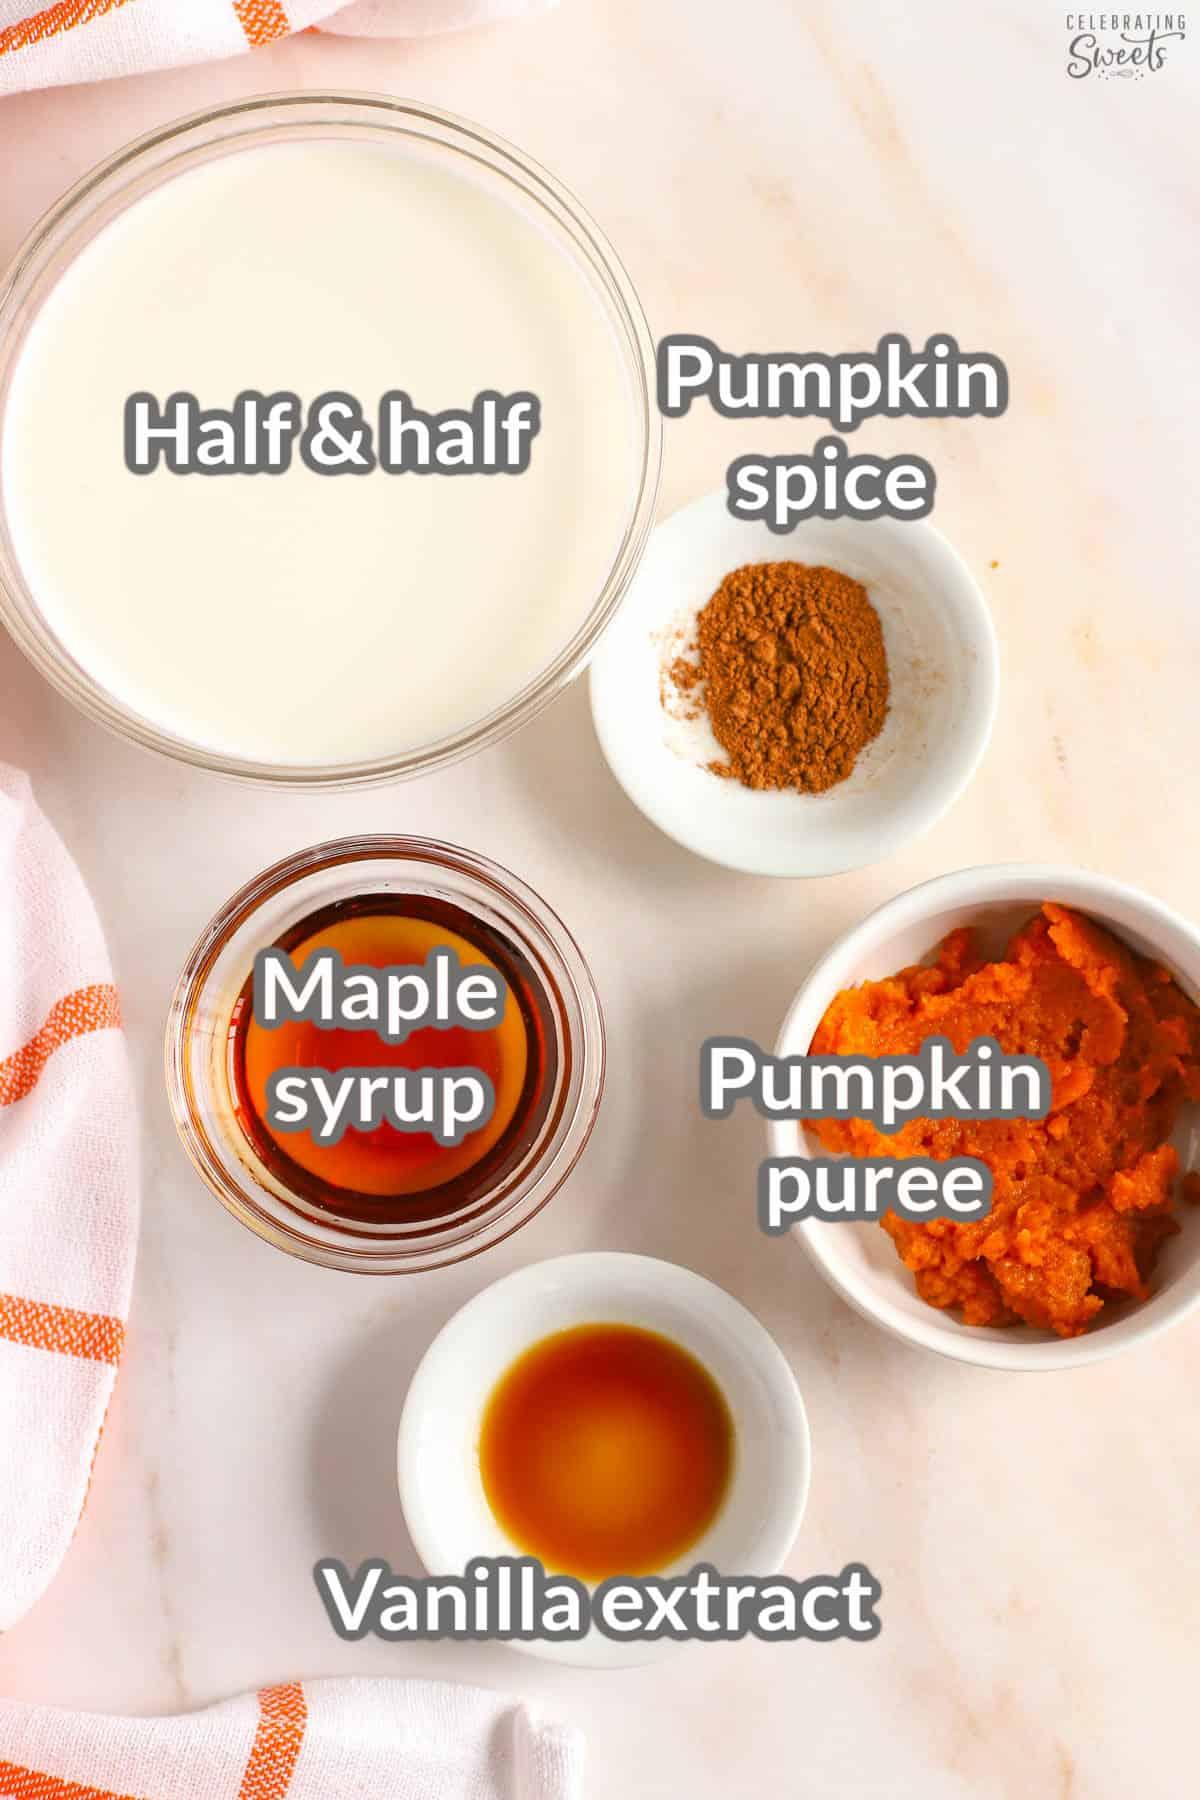 Pumpkin spice creamer ingredients: half and half, vanilla, pumpkin, spices, syrup.